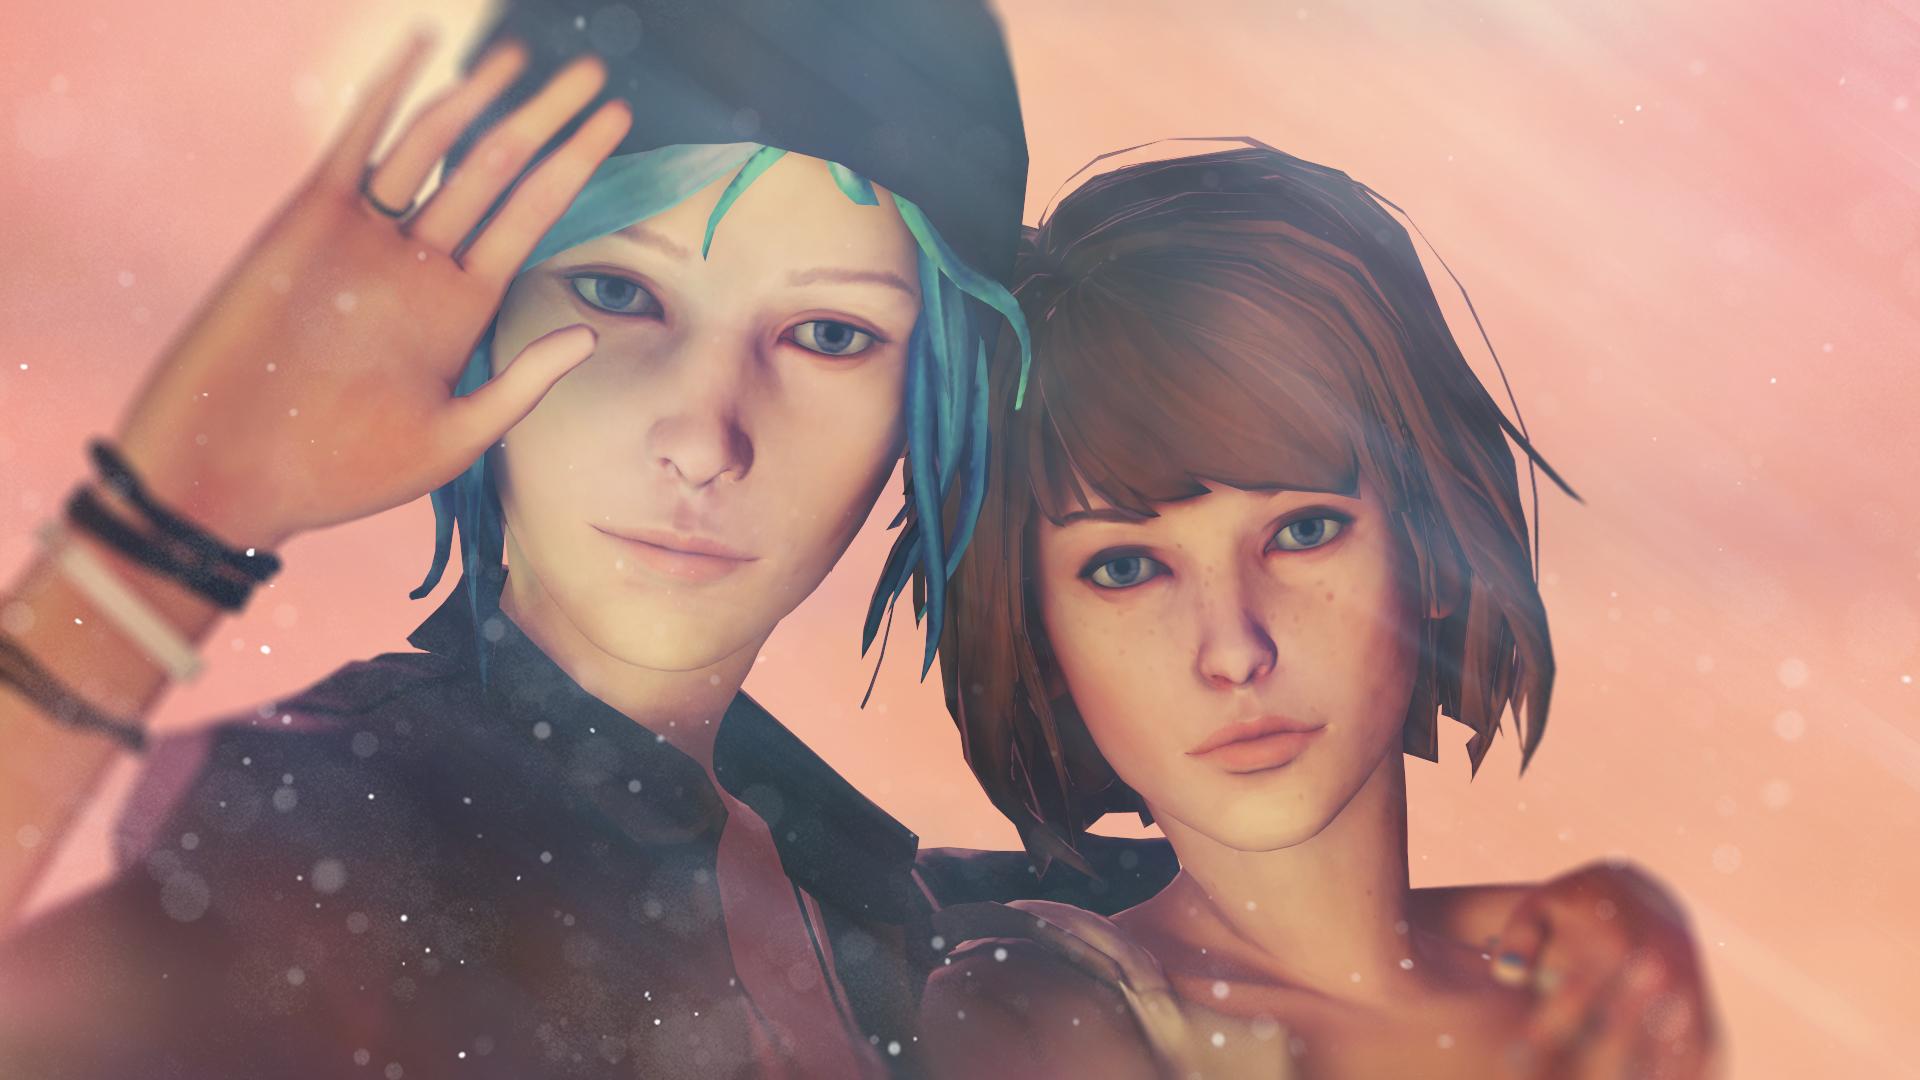 Life is strange   Max and Chloe [SFM] by Mrjimjamjamie 1920x1080